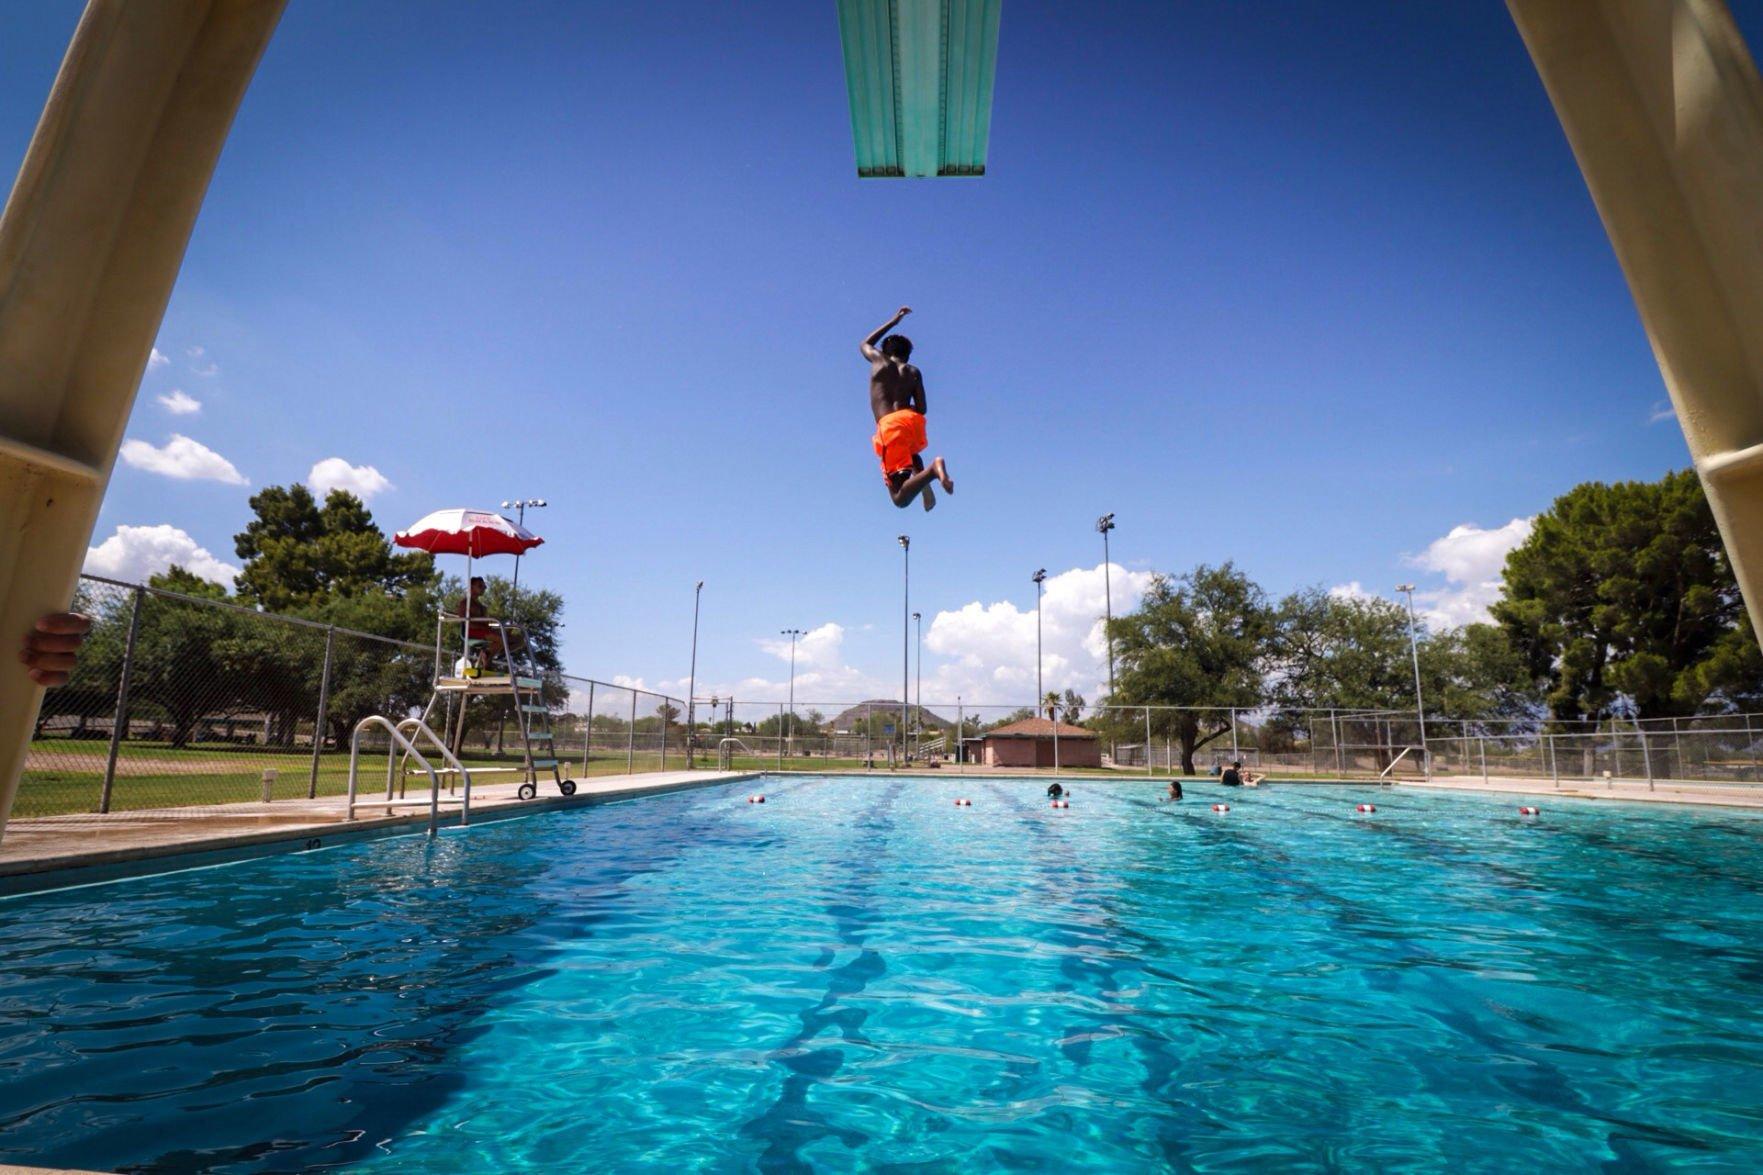 Lifeguard shortage leaves Pima County scrambling to staff pools | Tucson.com